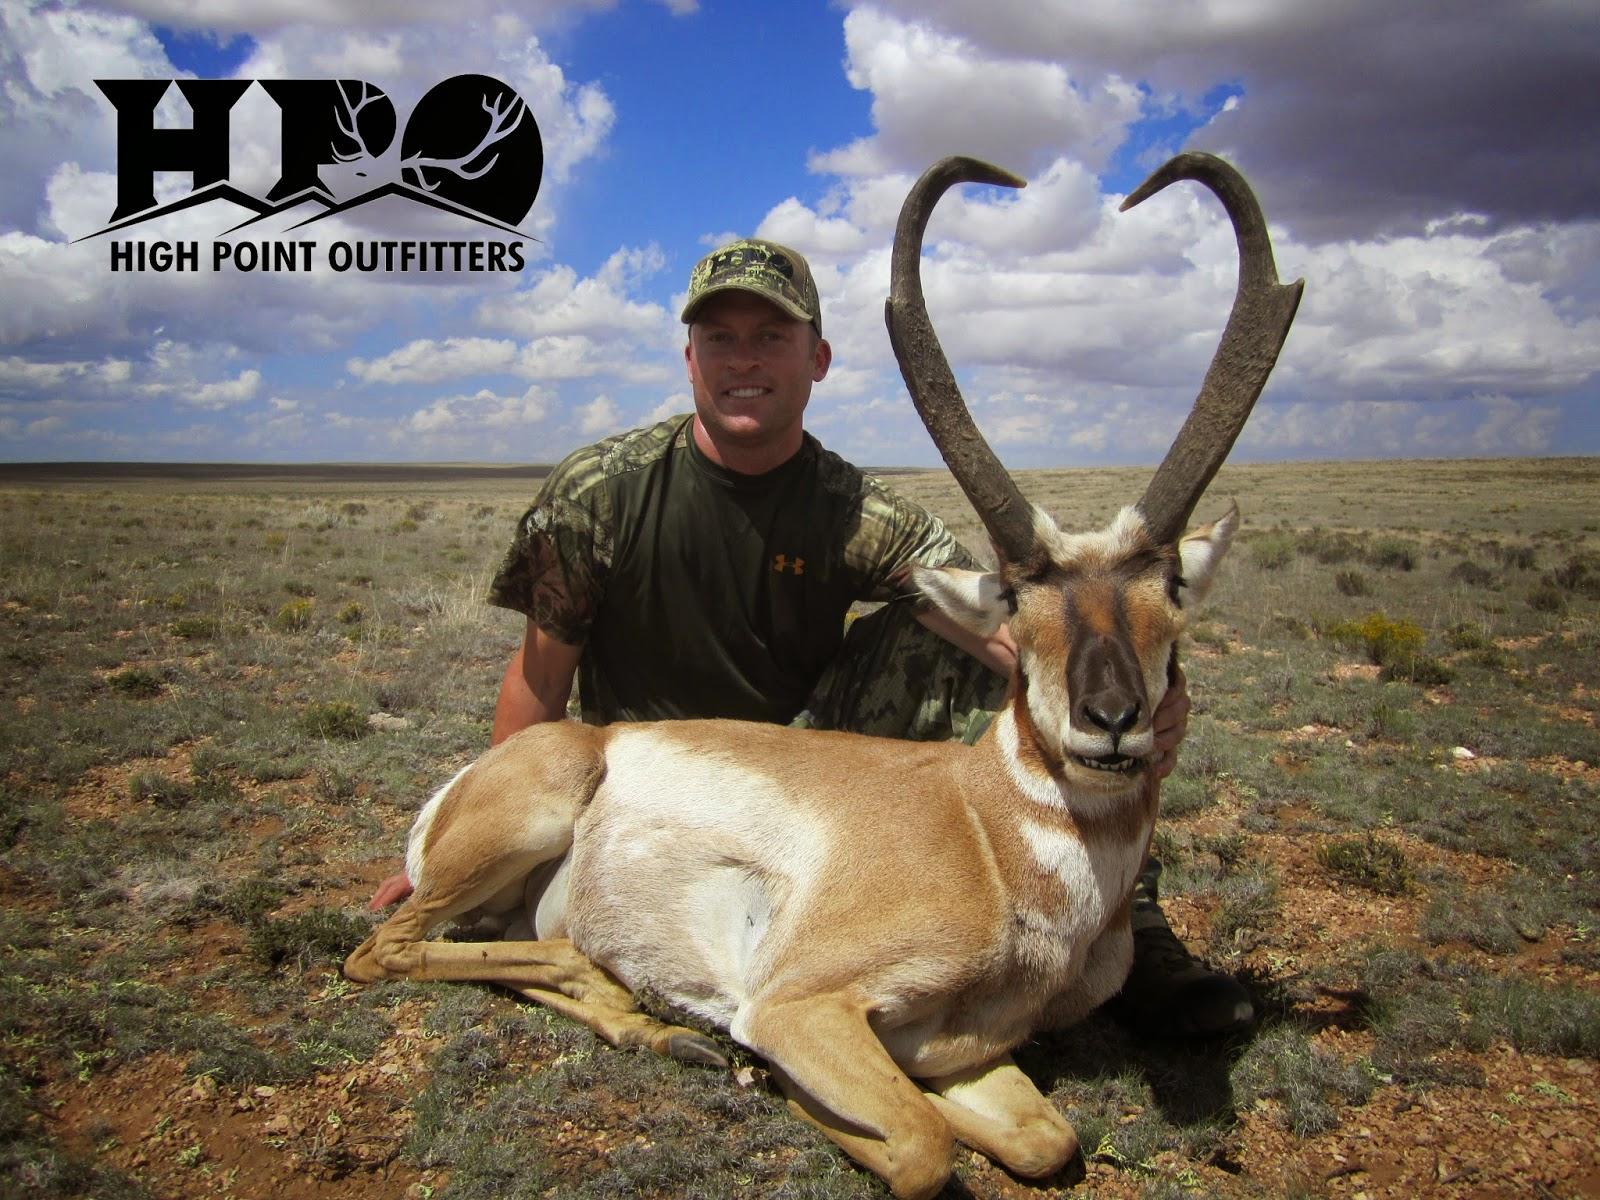 Arizona Antelope - Hig...